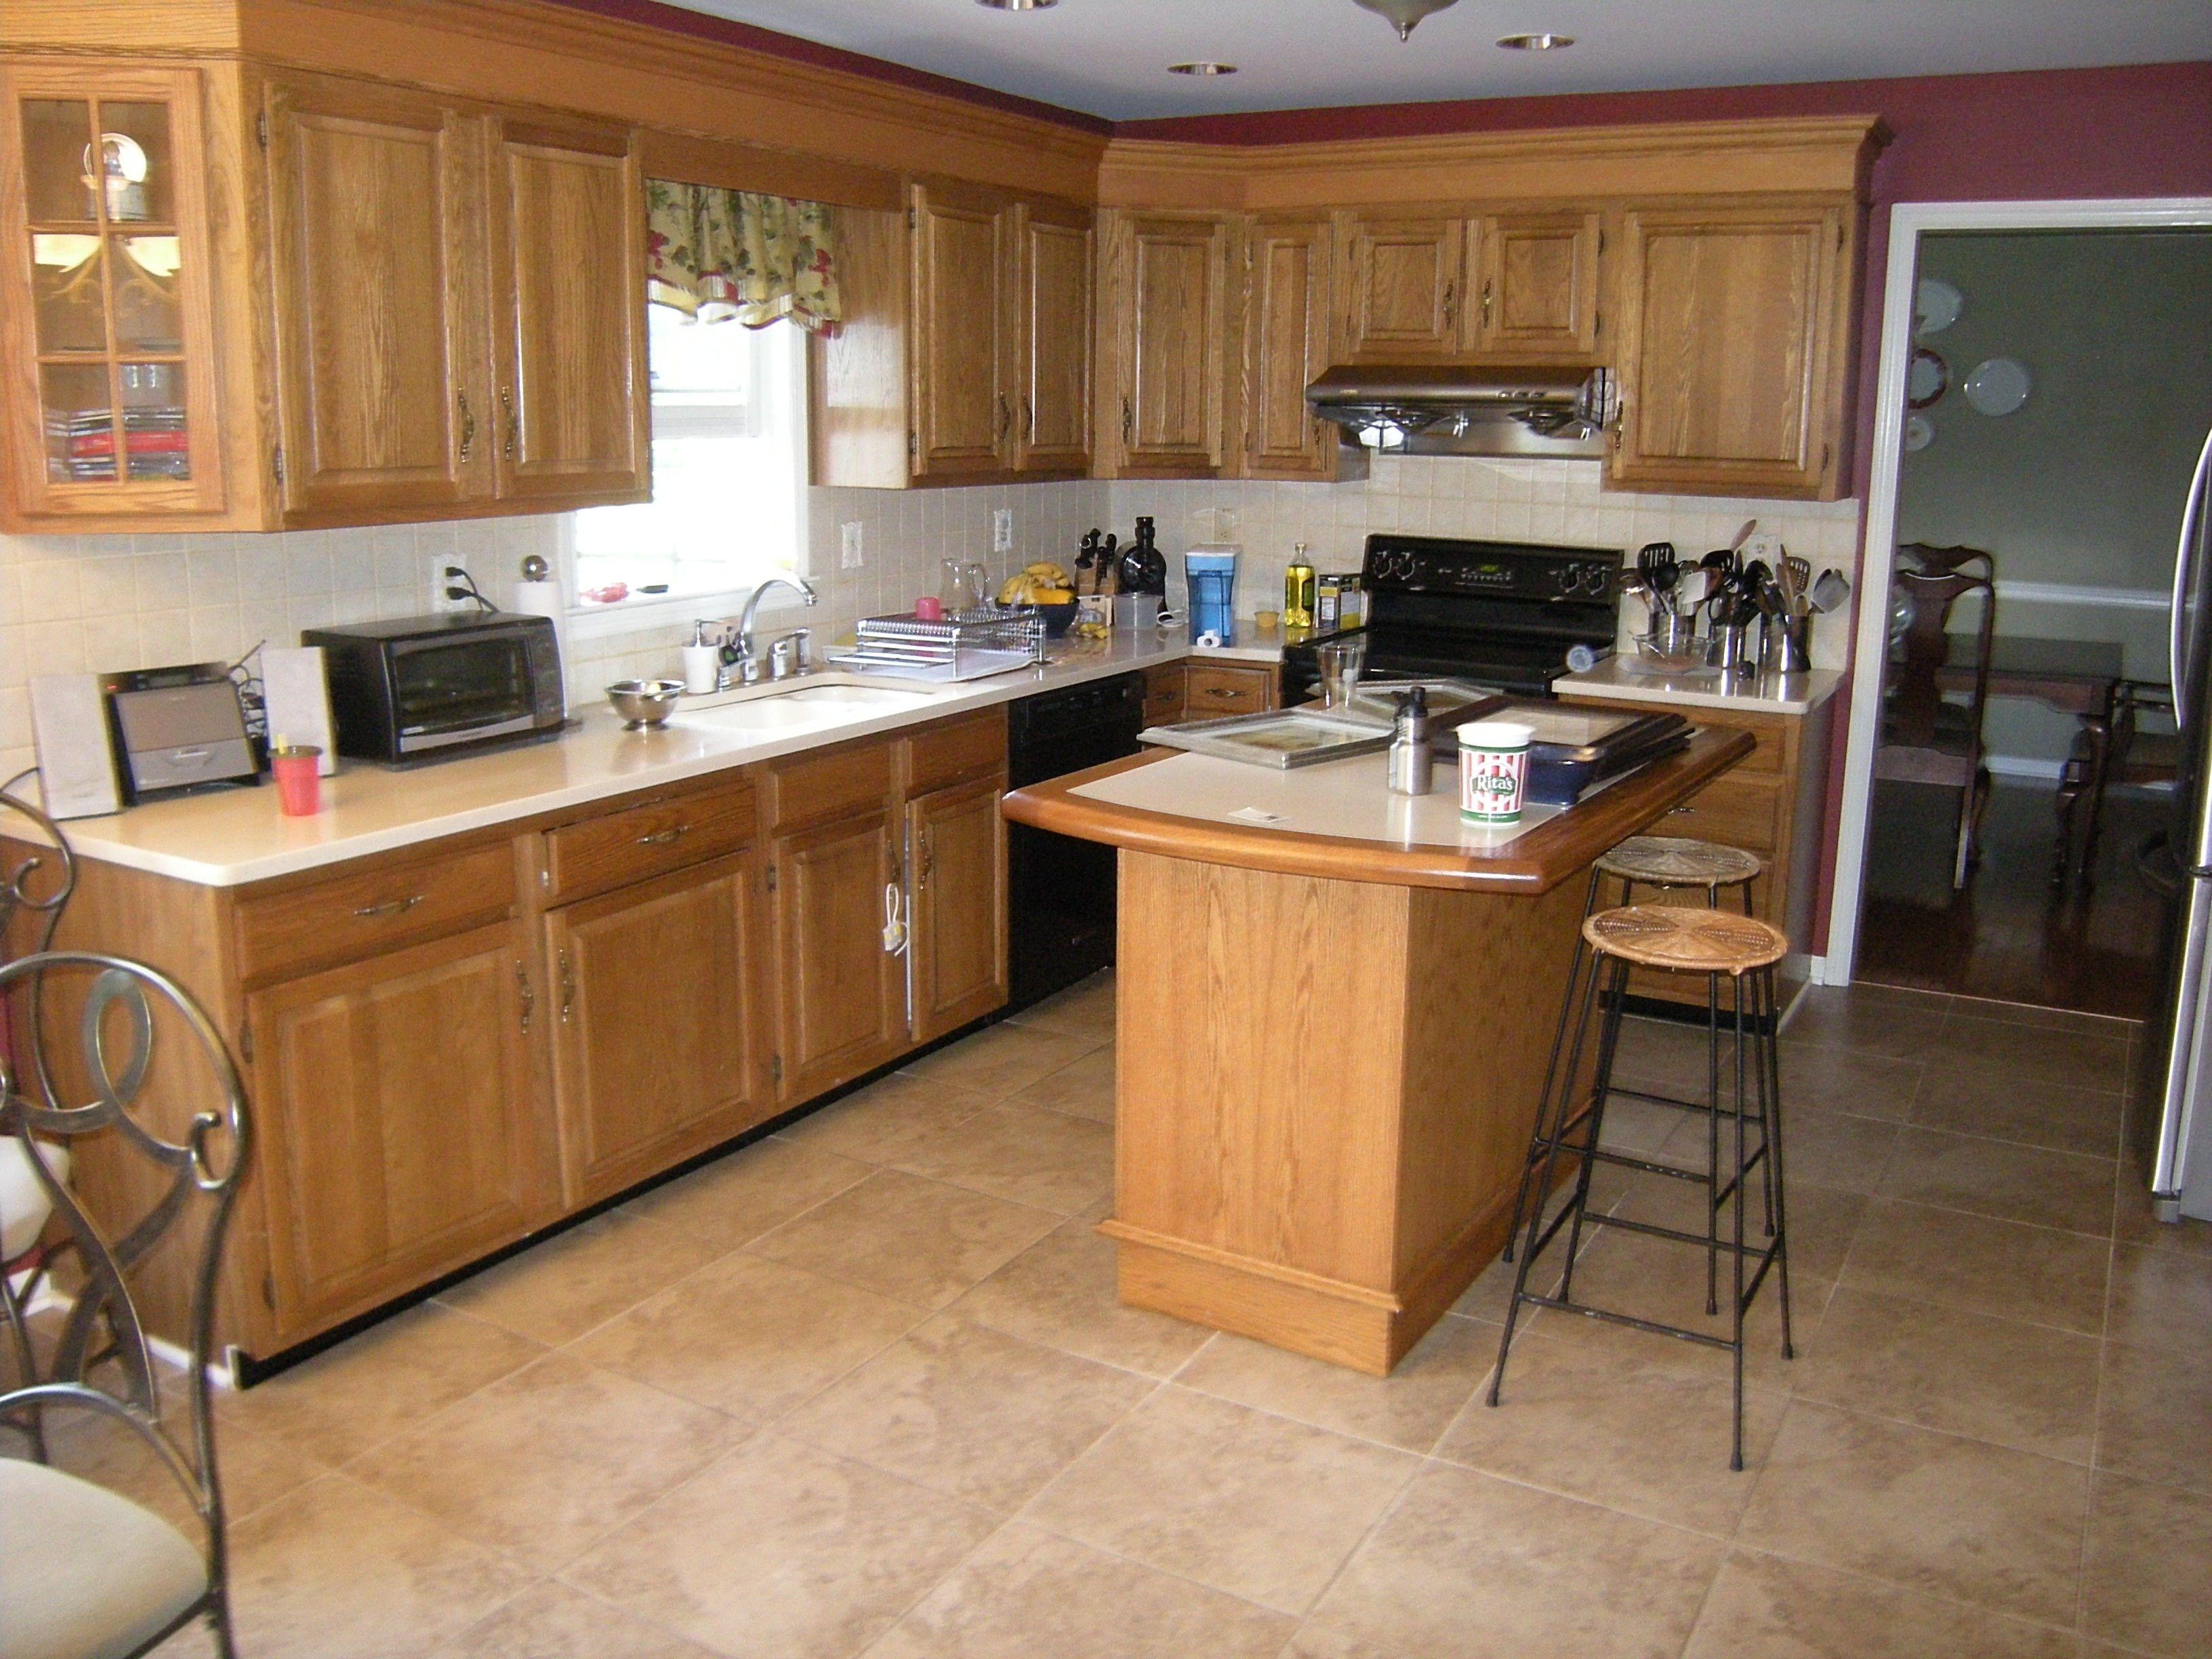 kitchen floor tile ideas with oak cabinets  kitchen